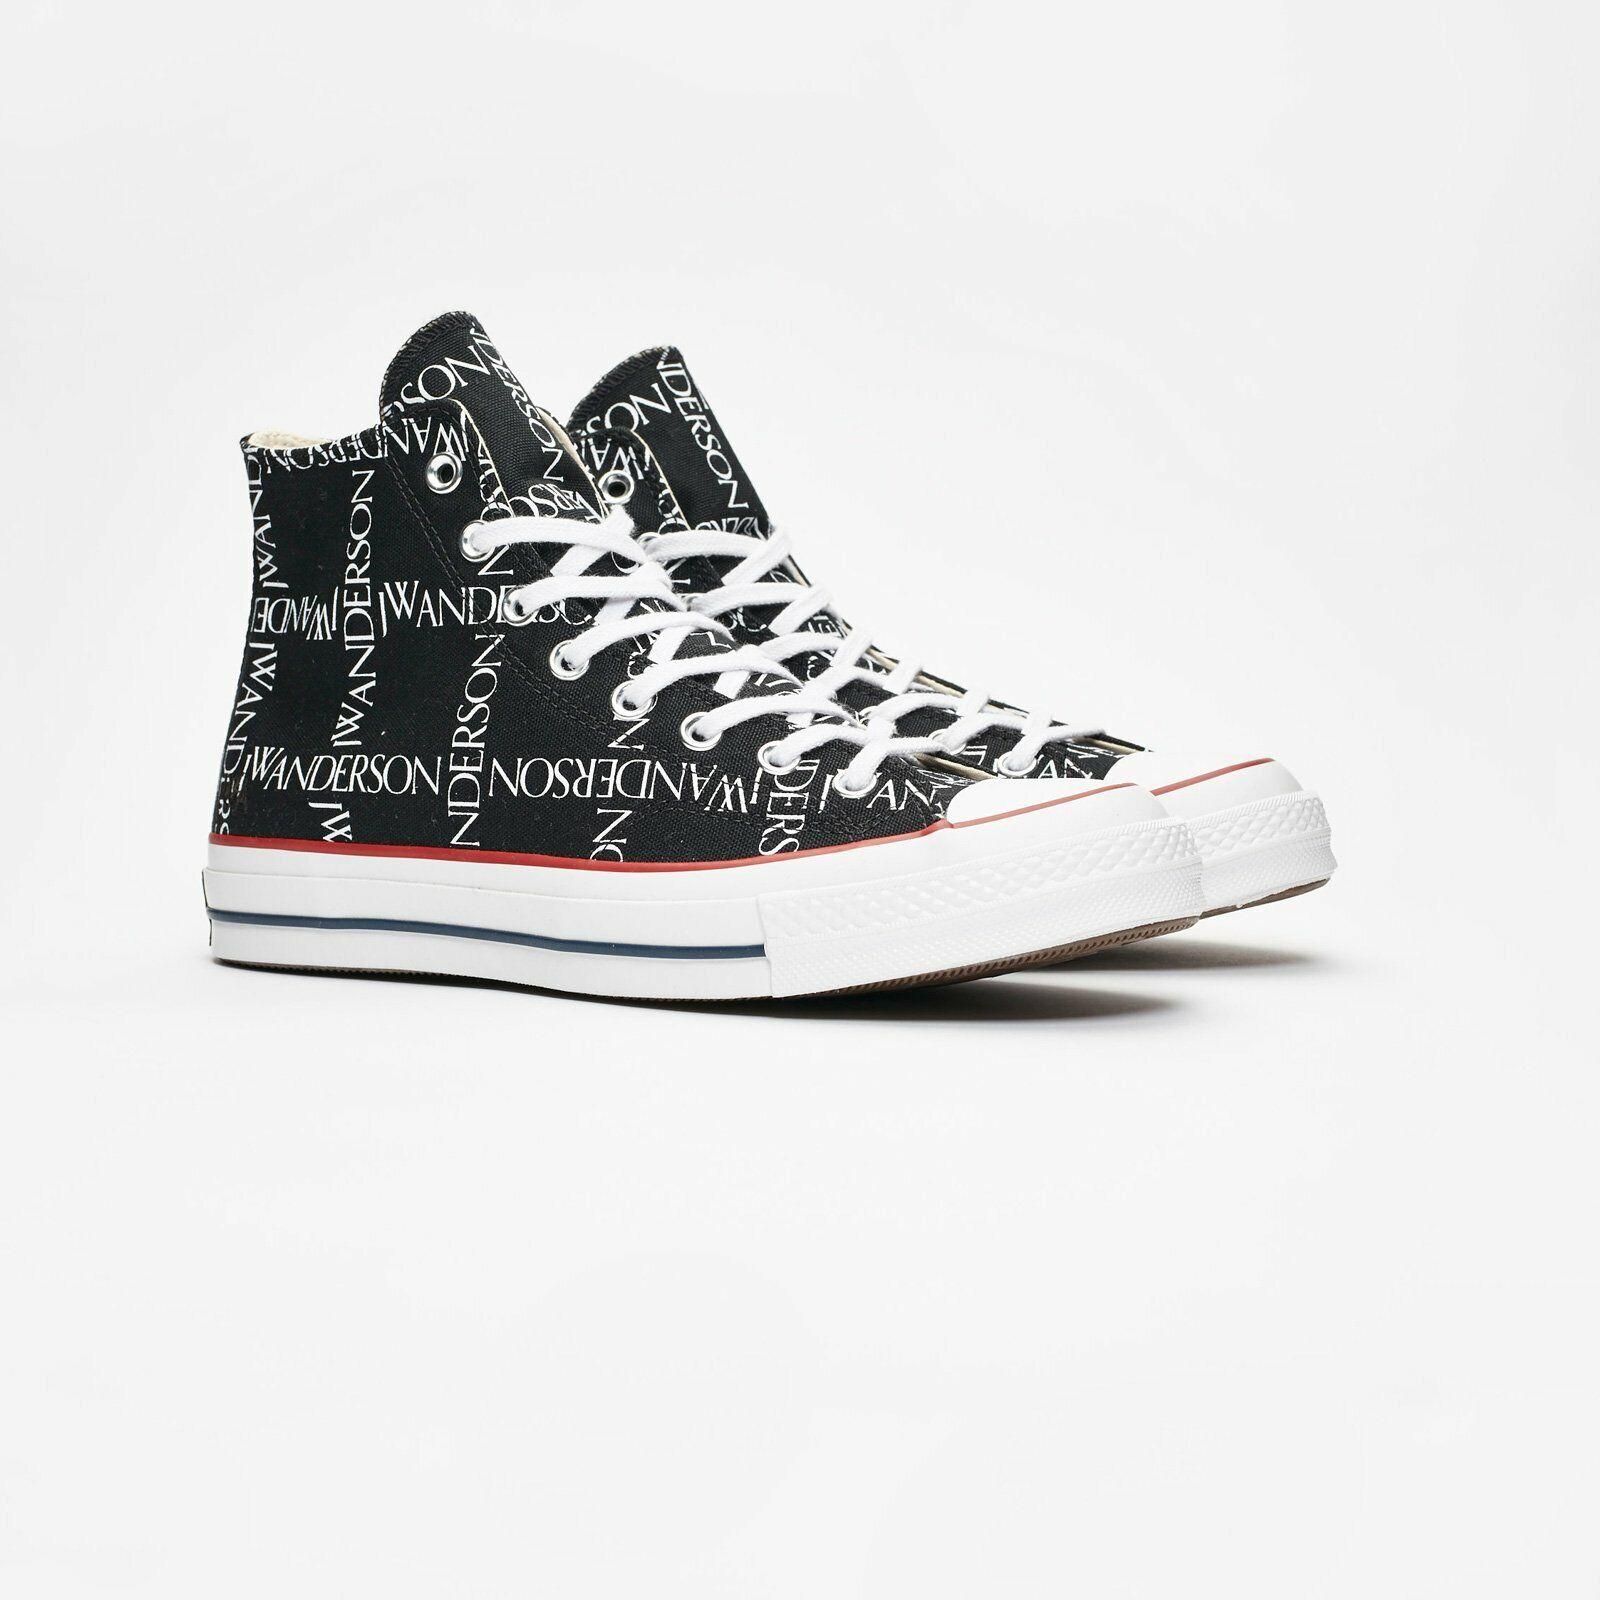 CONVERSE x JW Anderson Black Chuck 70 Hi Sneakers #160807C US M9.5/W11.5 NWOB